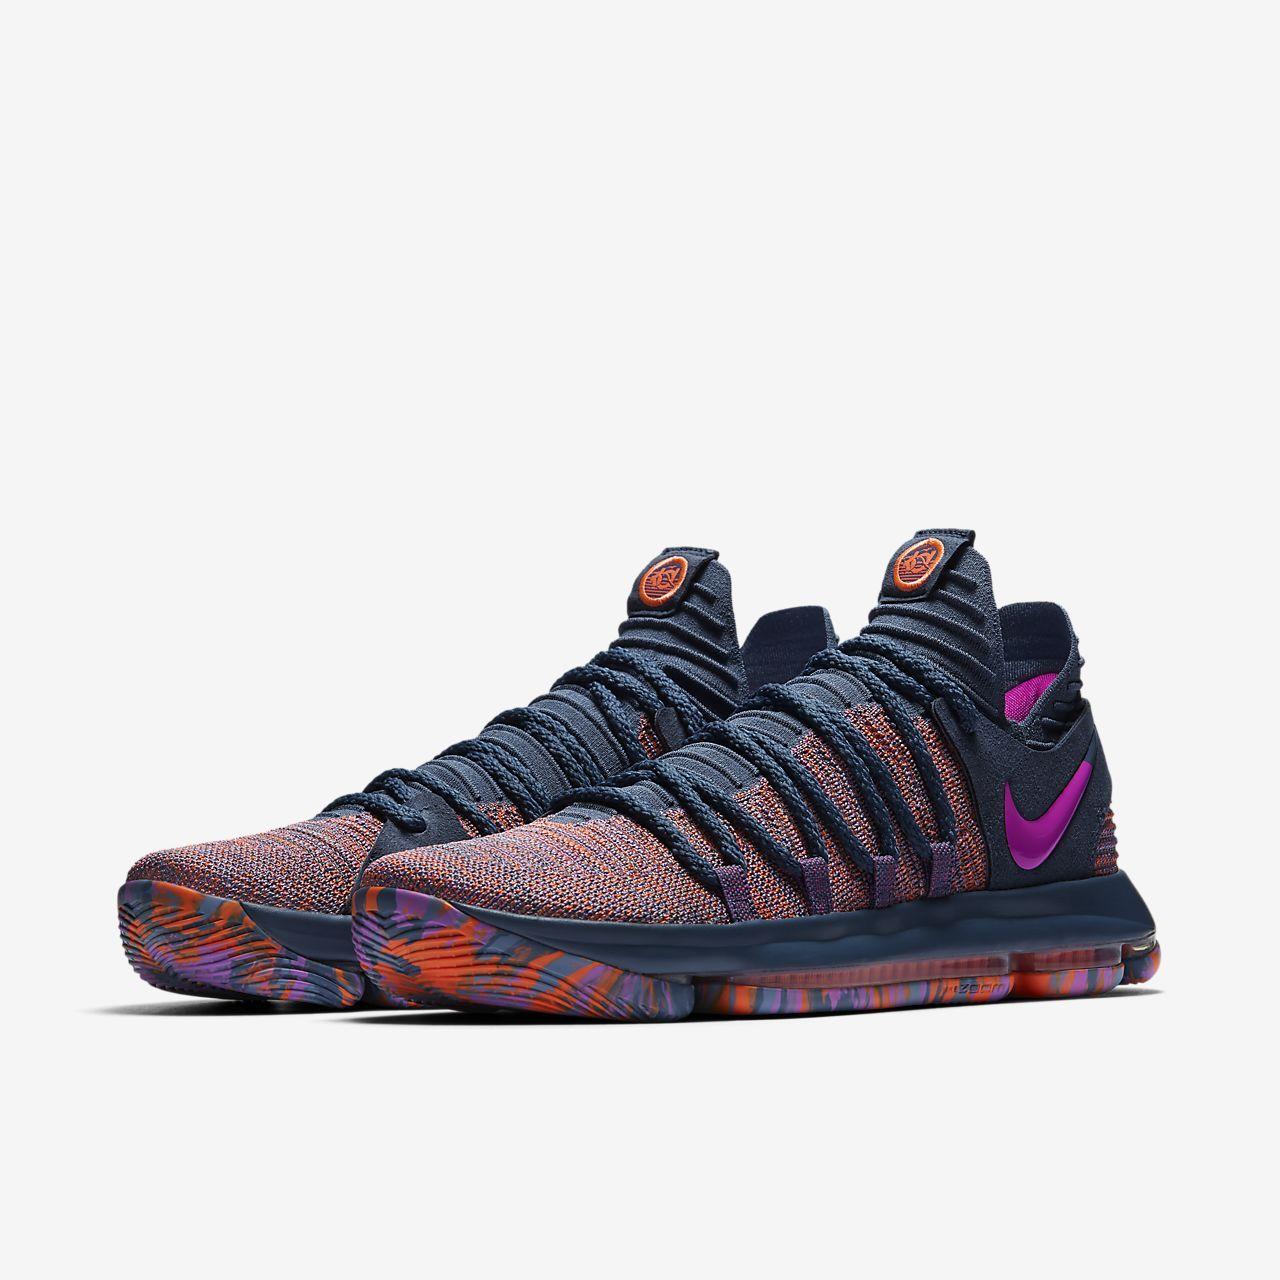 99d2779dea6b Nike Zoom KDX AS Basketball Shoe